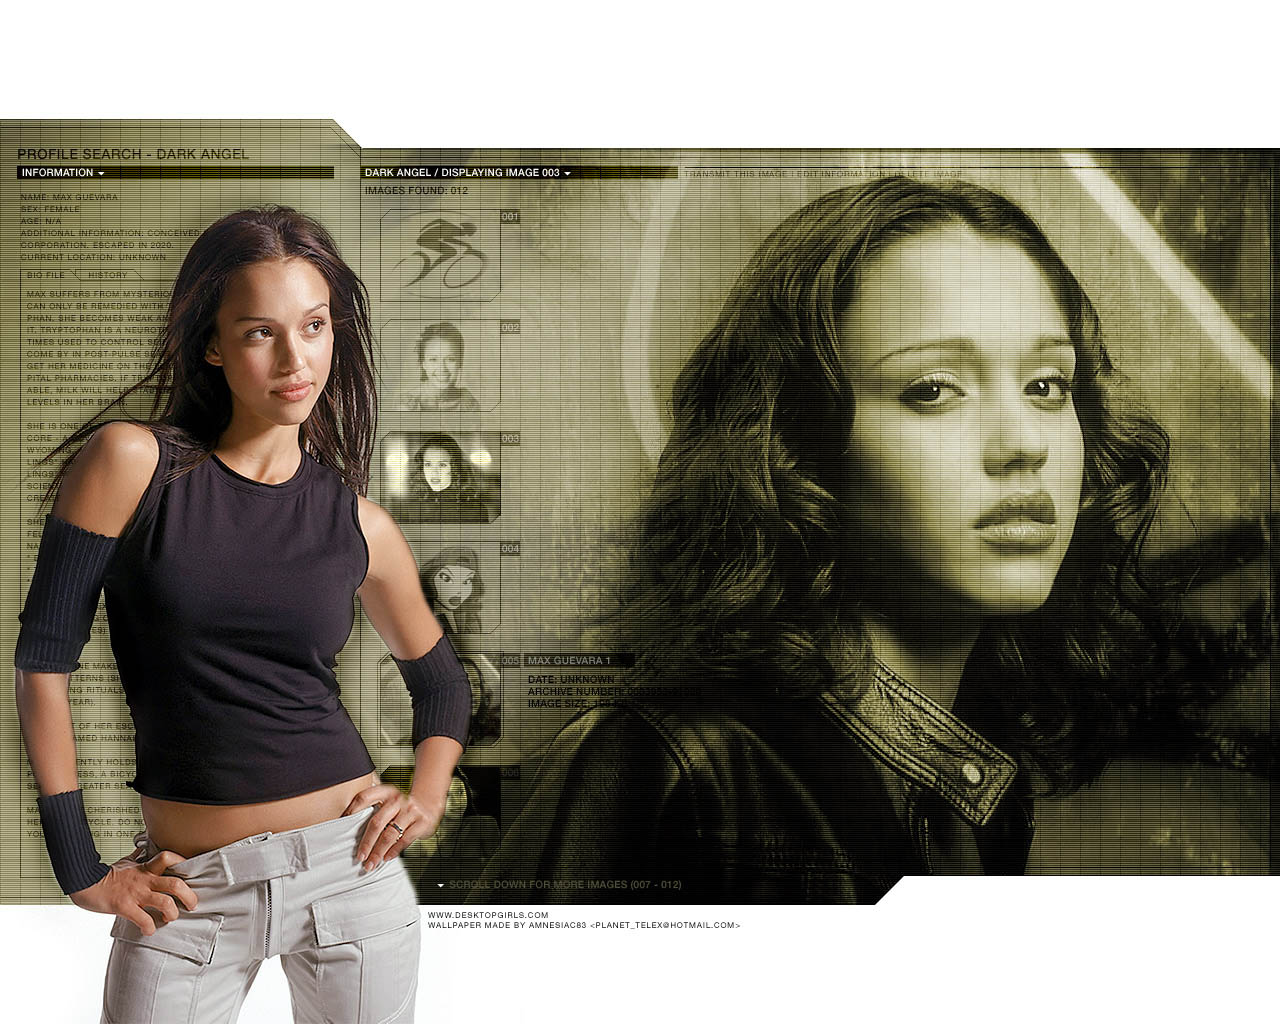 Jessica Alba Dark Angel wallpapers   W3 Directory Wallpapers 1280x1024